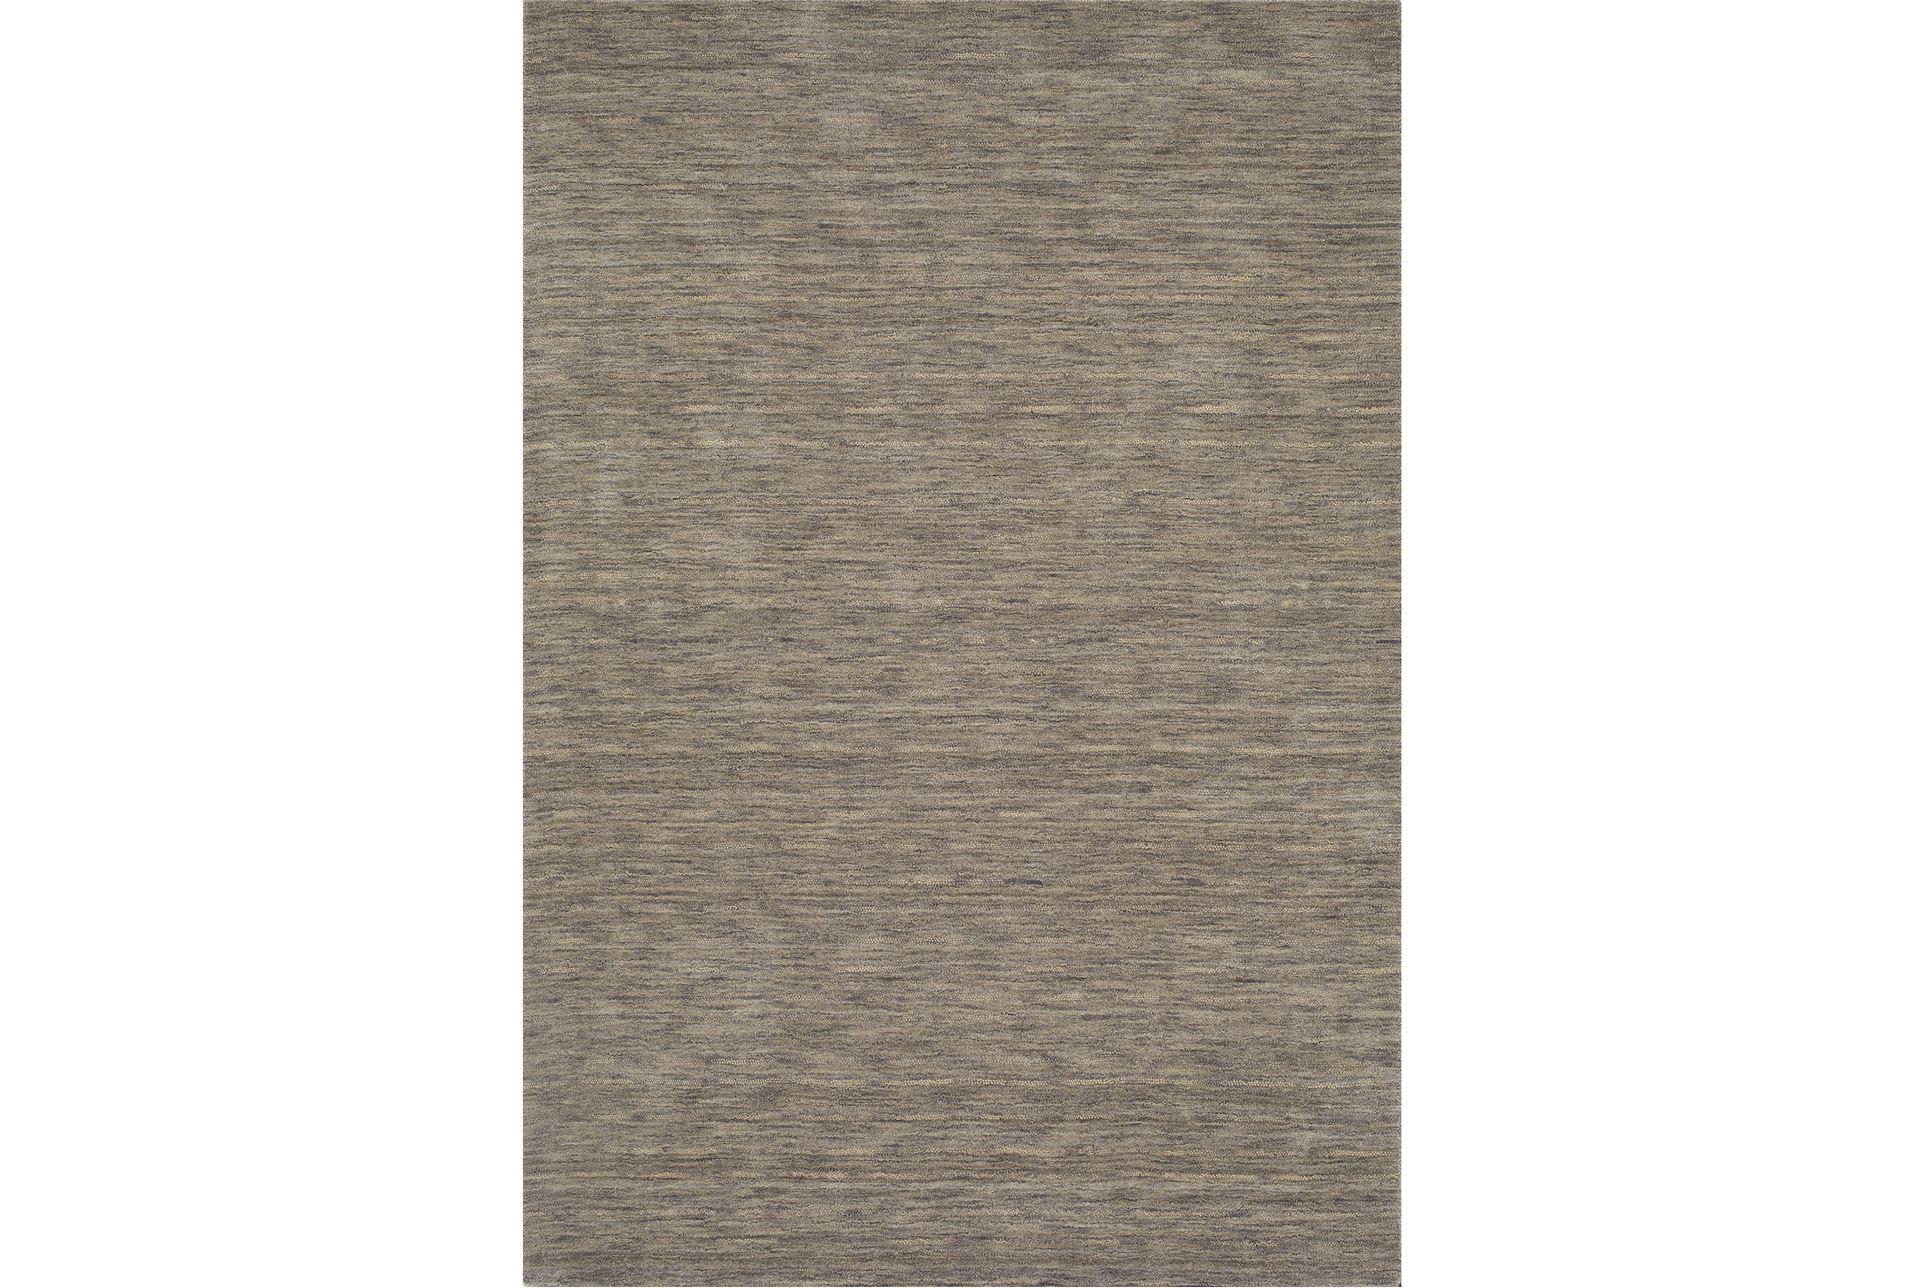 108x156 Rug Gabbeh Granite Living Spaces